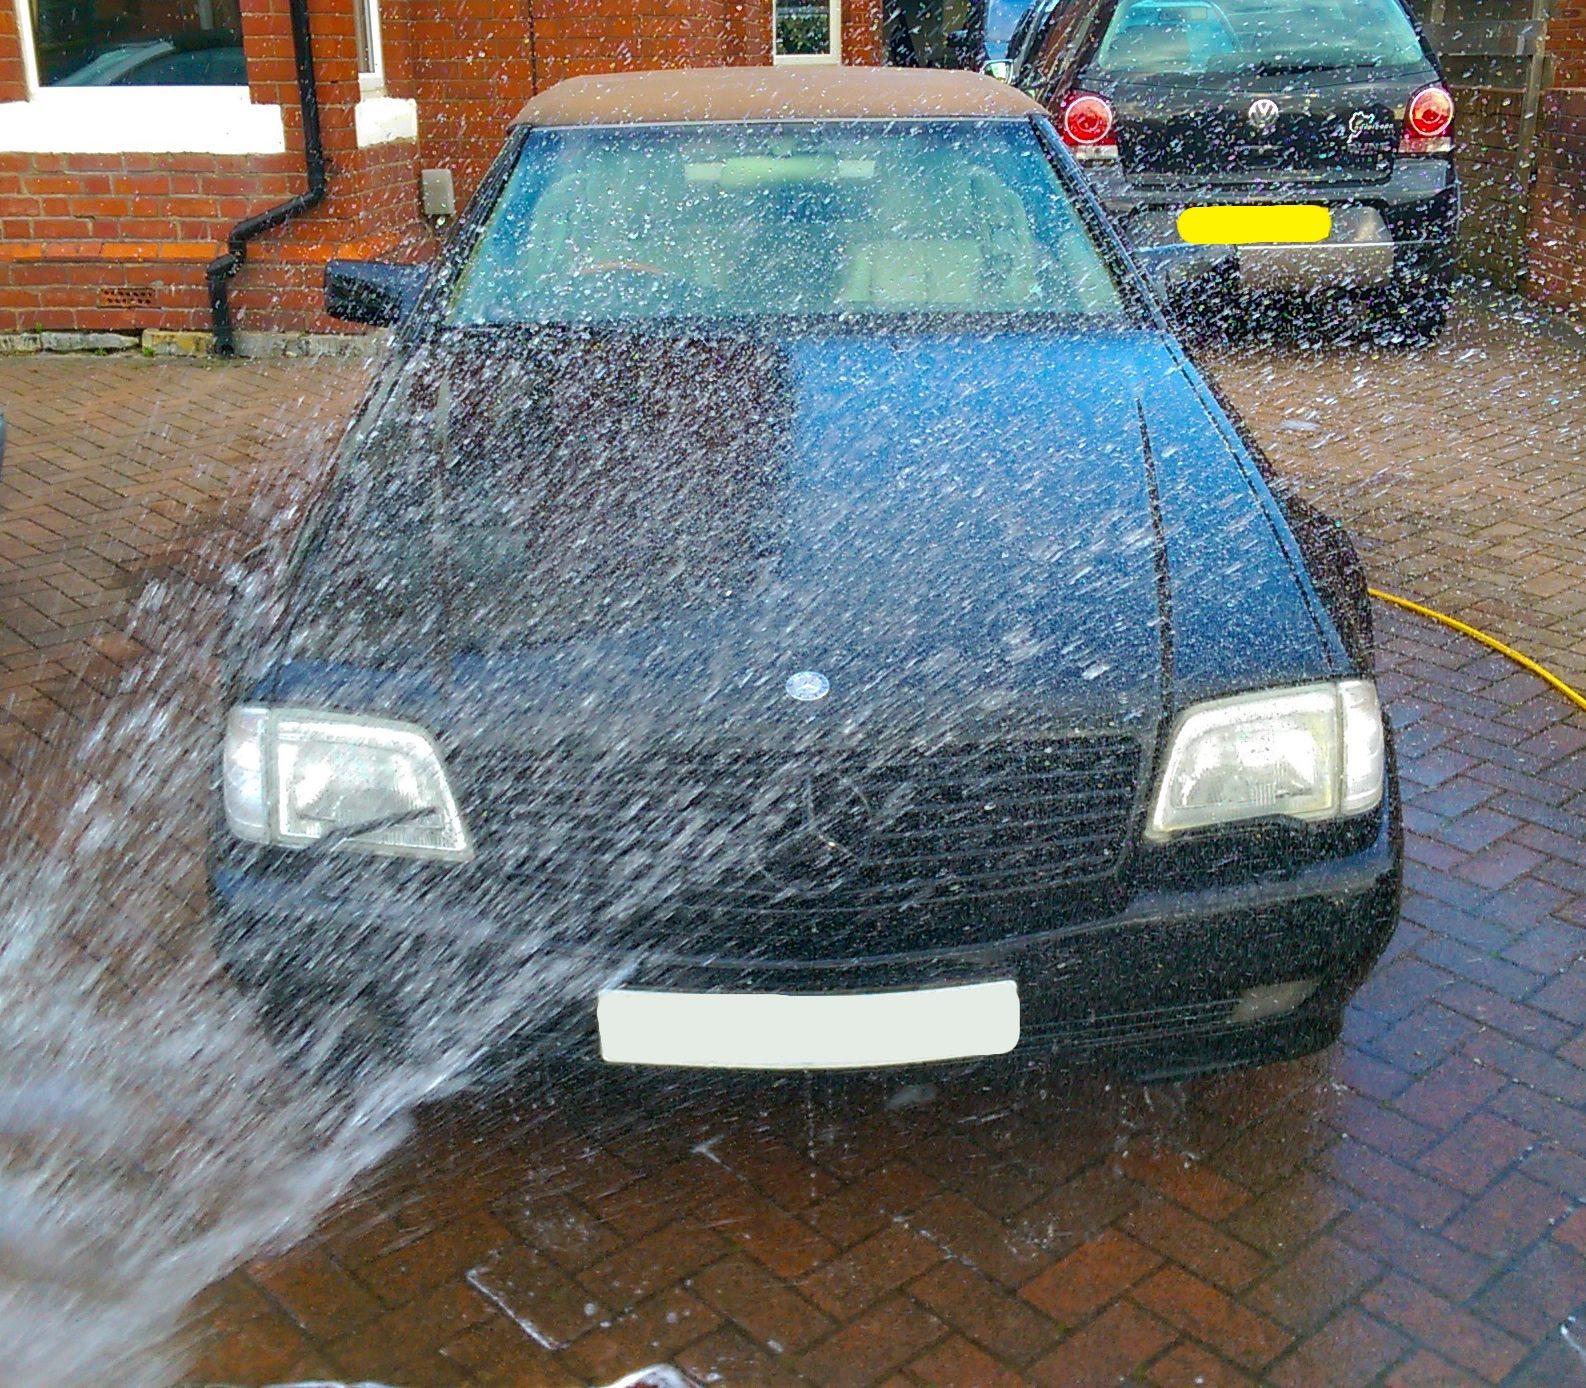 best car washing technique to avoid swirl marks